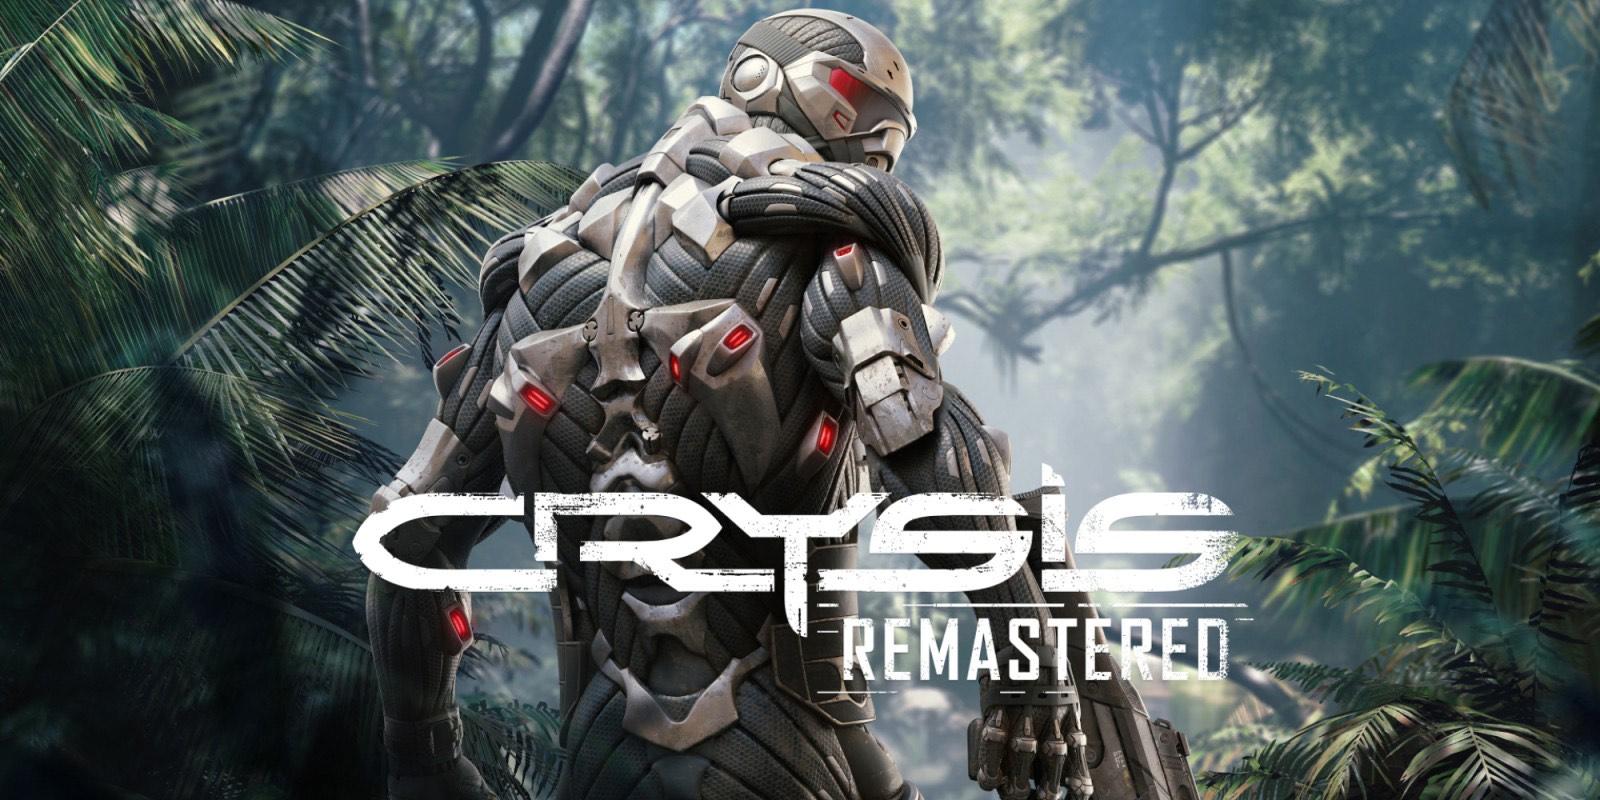 Crysis Remastered na eshop PL Nintendo Switch (16.19 GBP)